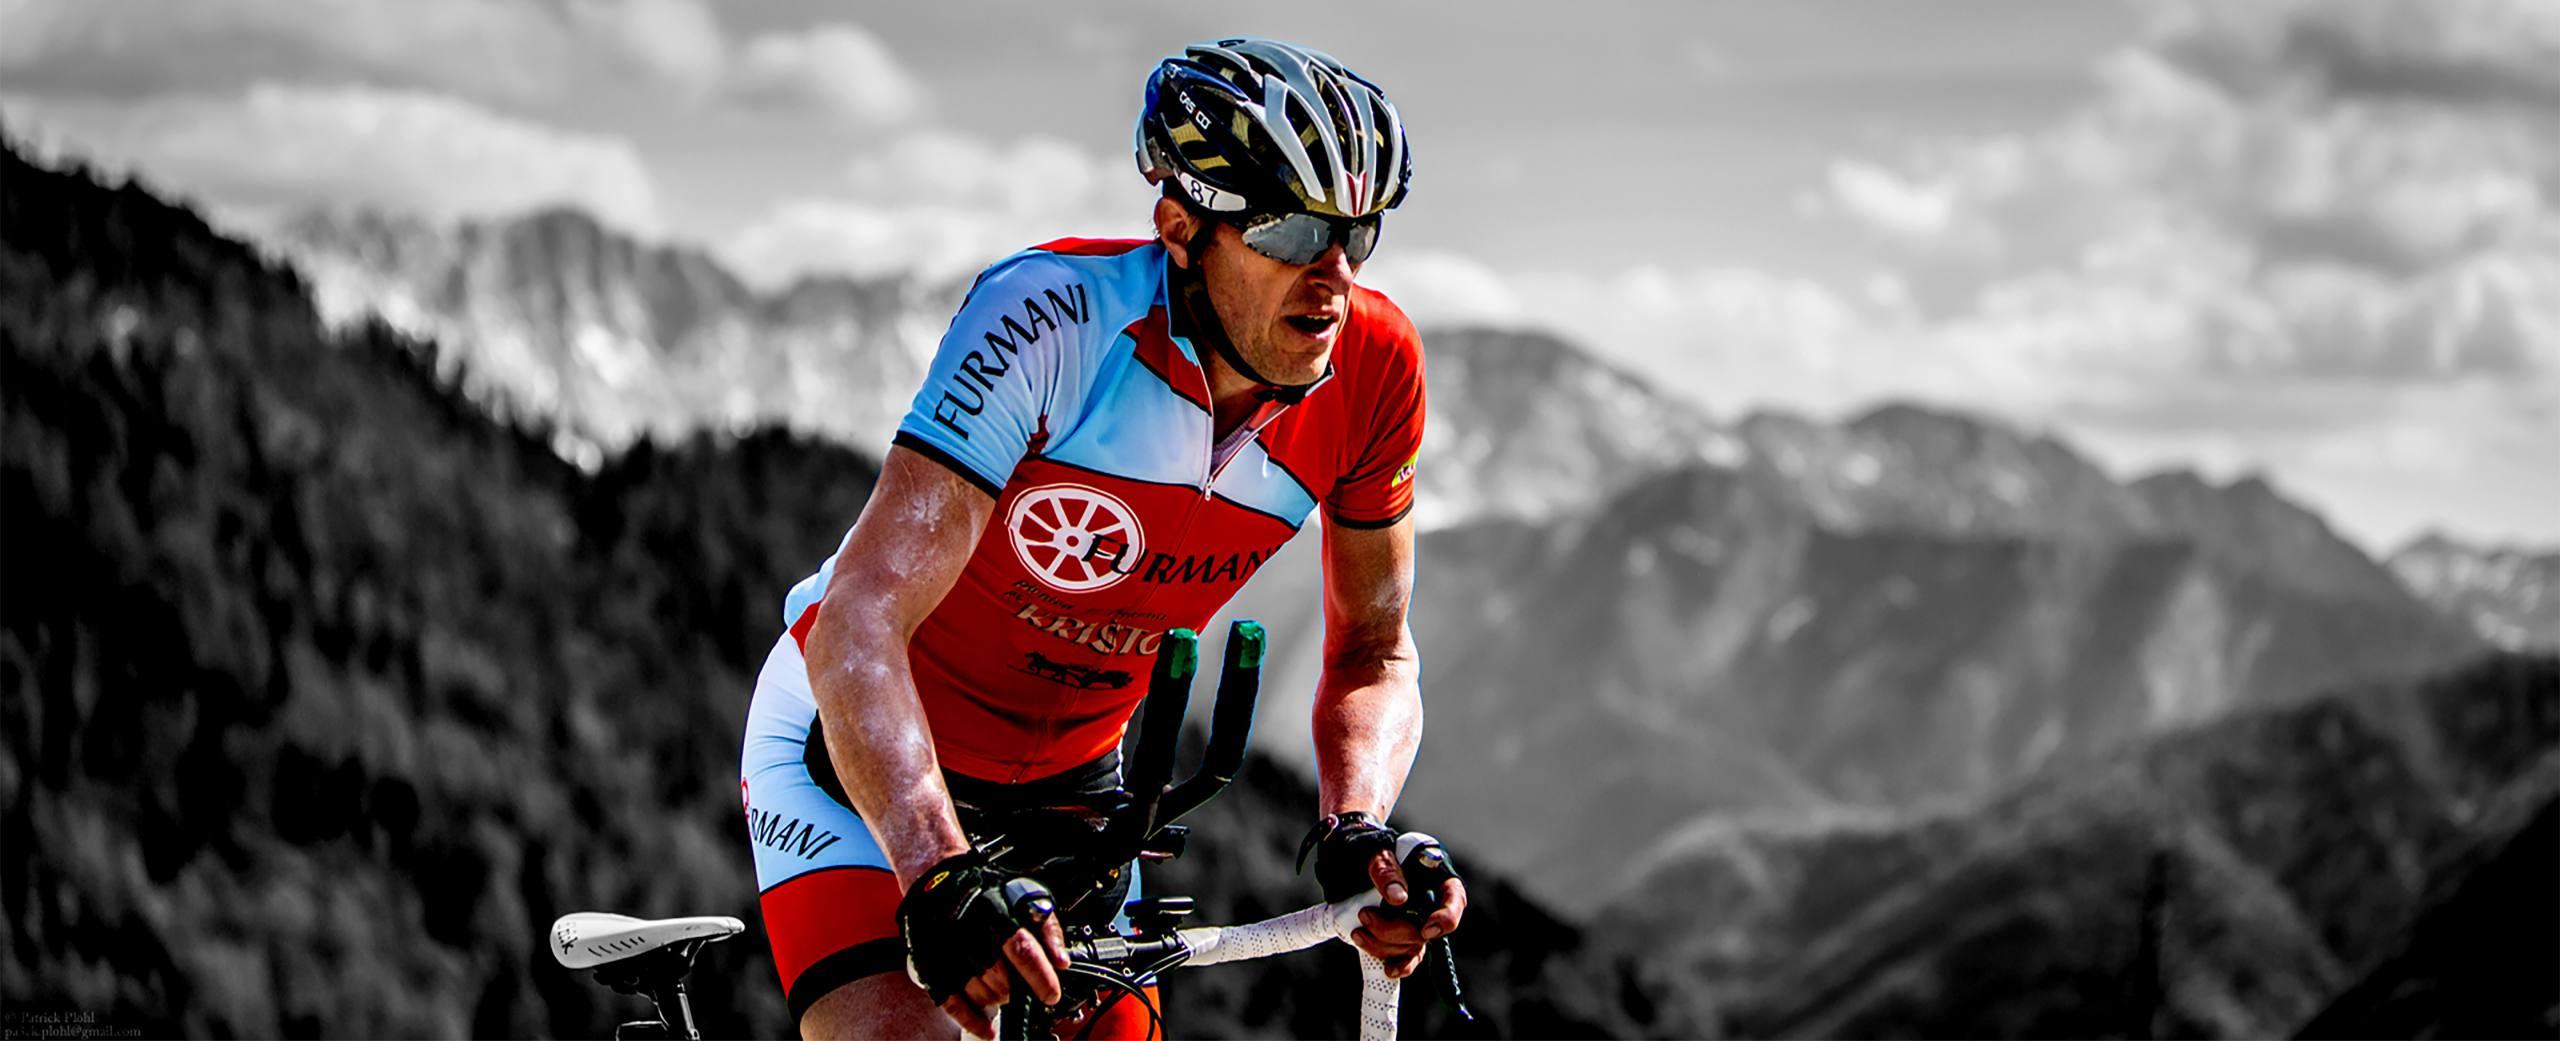 Wooden bike, Wooden bike frame, Wooden mountain bike, Eco friendly bike – spring-sport.si članki 1632456448